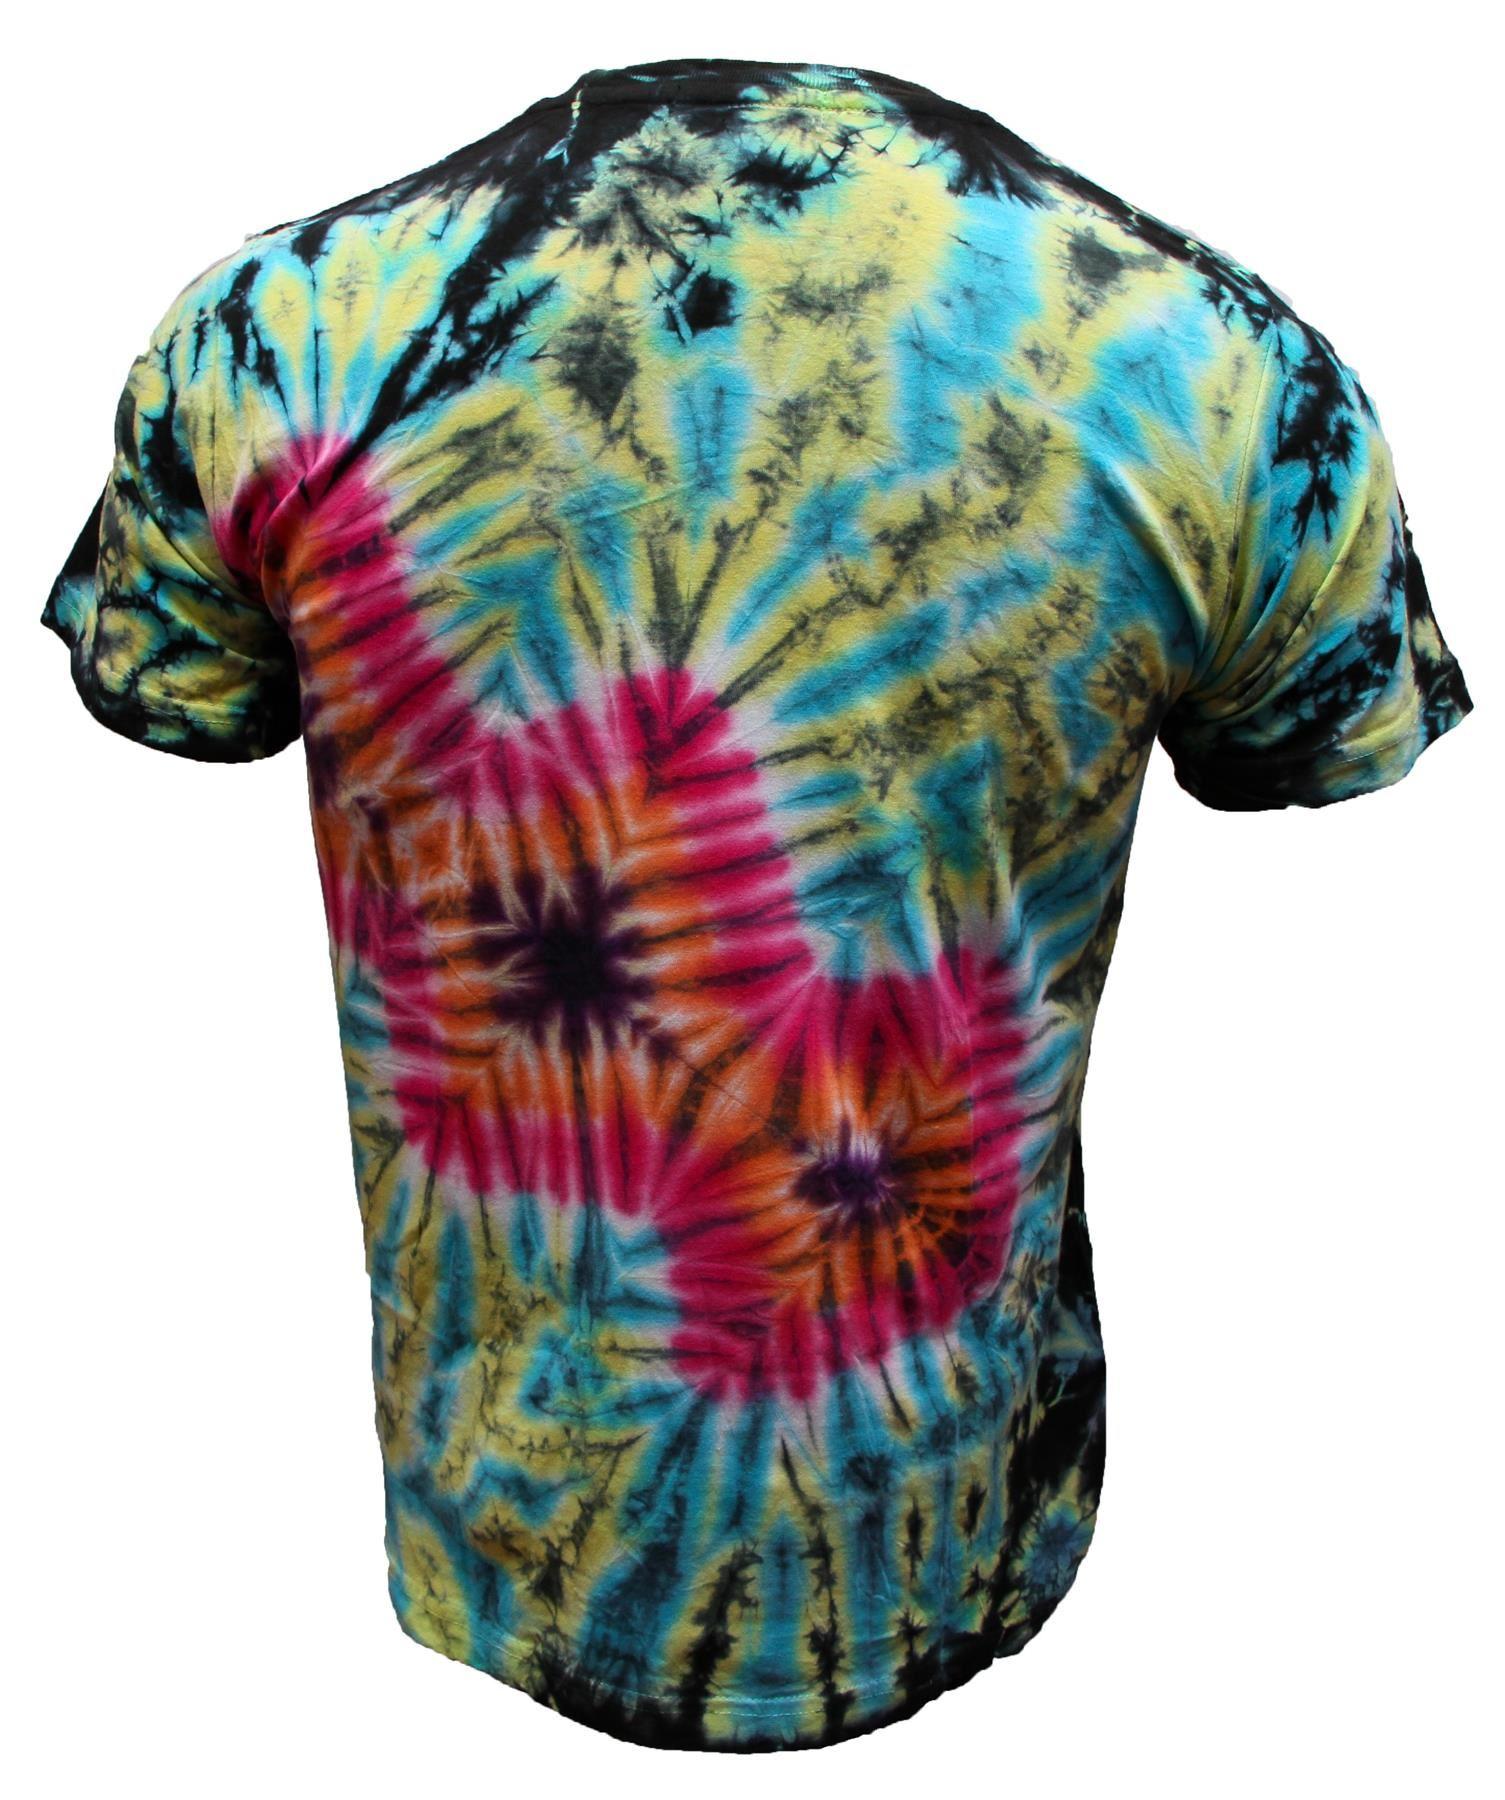 Tie-Dye-T-Shirt-Music-Festival-Tye-Dye-Tee-Hipster-Retro-Unisex-Short-Sleeve-Top thumbnail 19